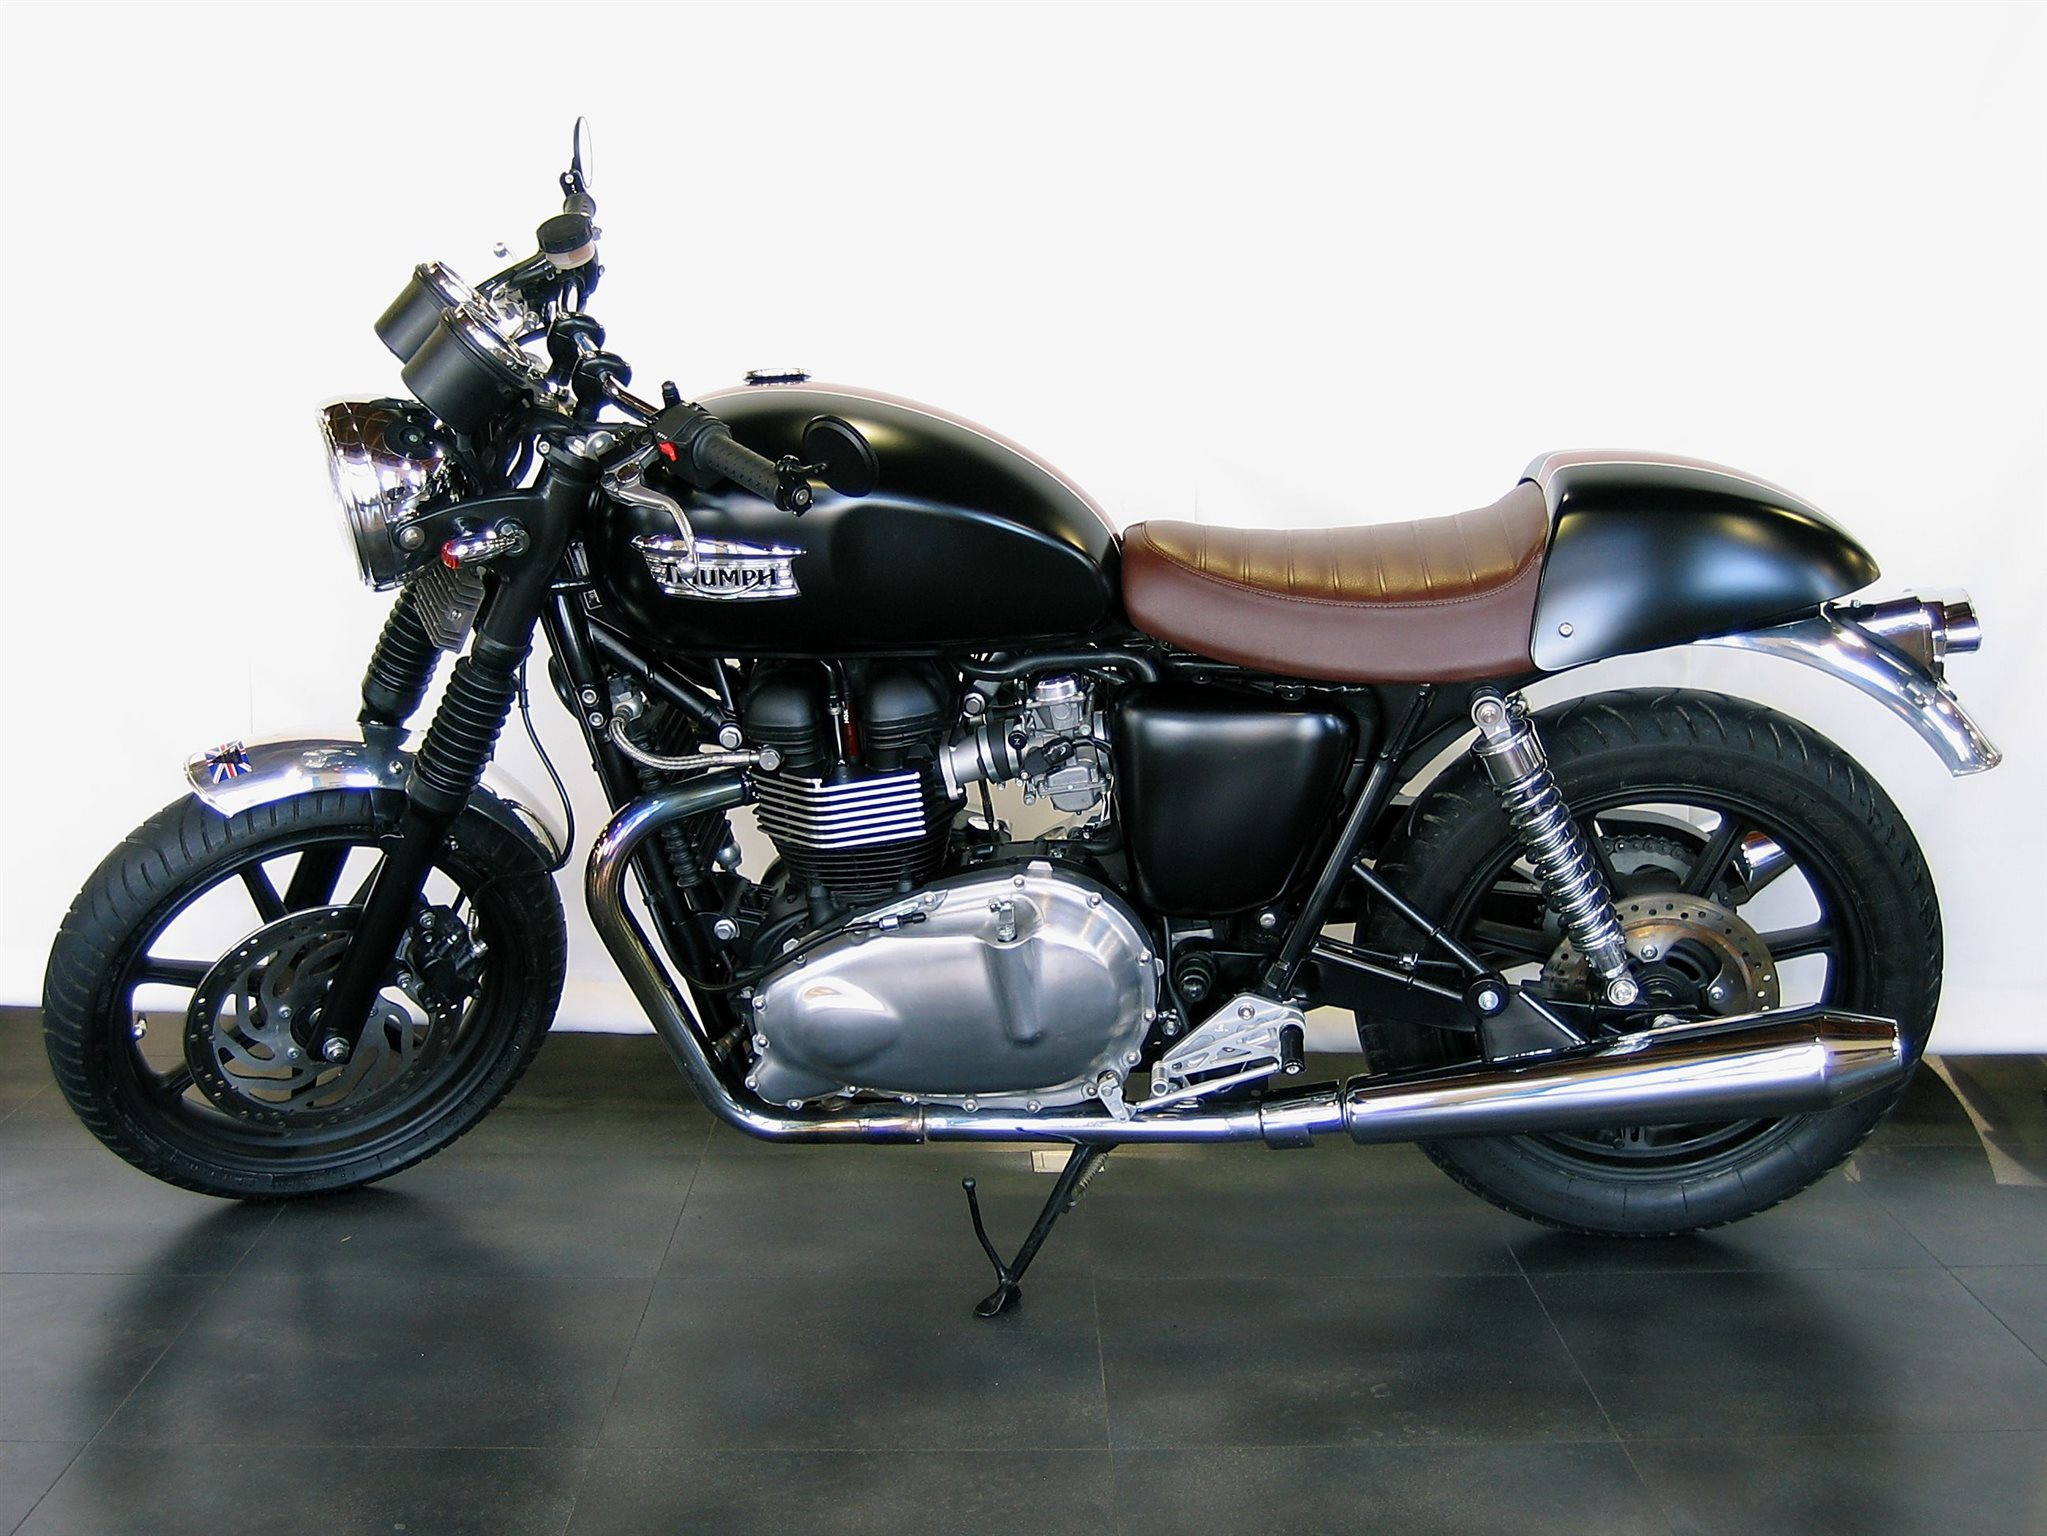 umgebautes motorrad triumph bonneville von sbf triumph bikes parts gmbh co kg. Black Bedroom Furniture Sets. Home Design Ideas